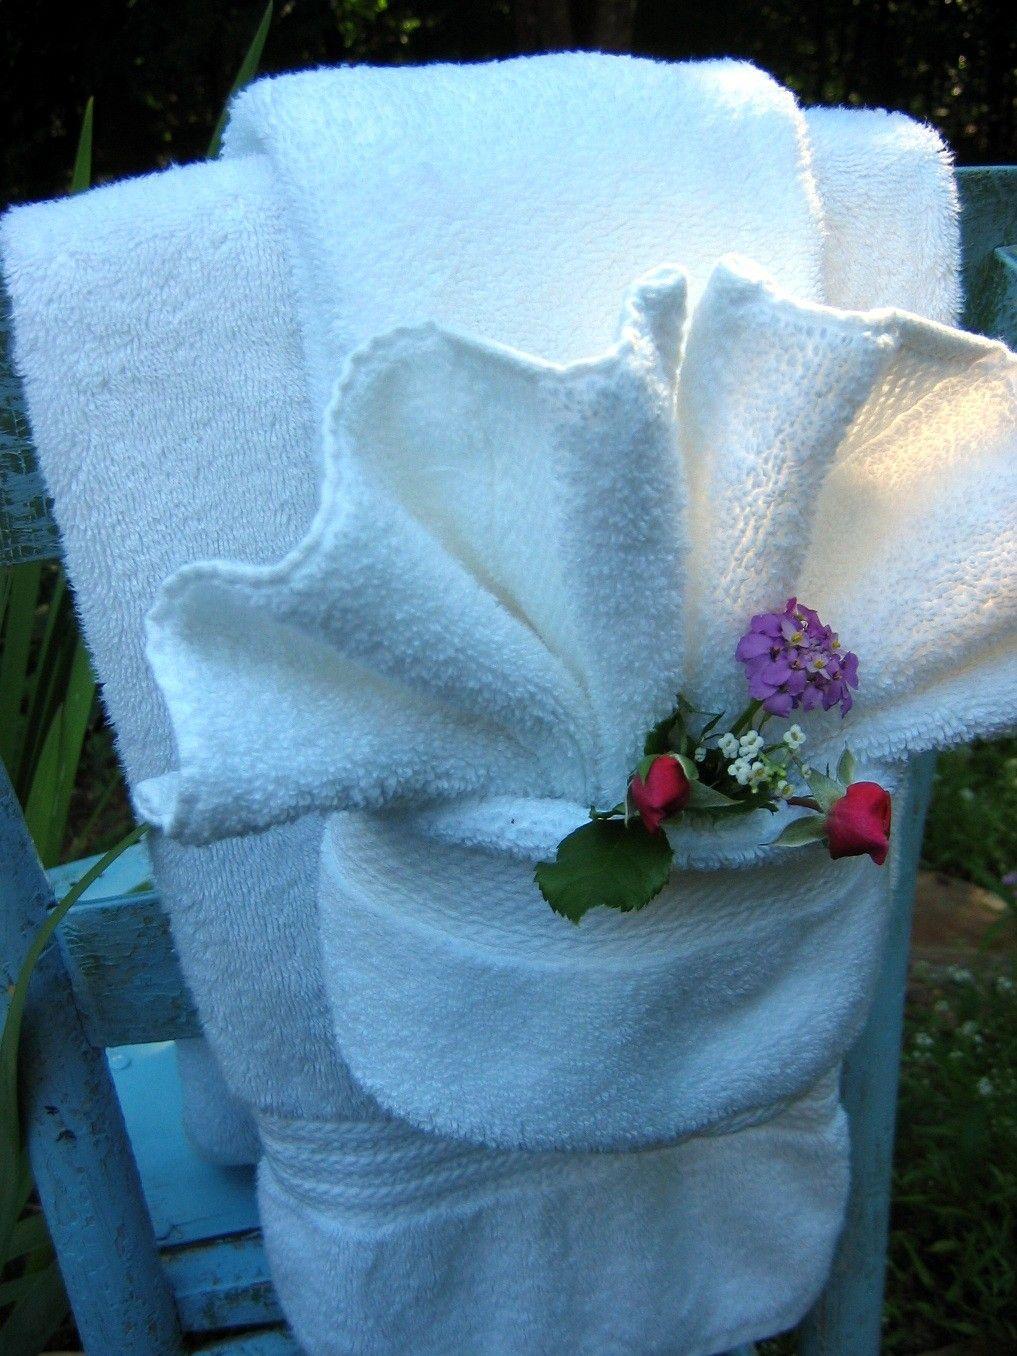 The Red Chair Blog Fancy Shmancy Towel Fold Tutorial  Decorating Inspiration Bathroom Towel Folding Designs Inspiration